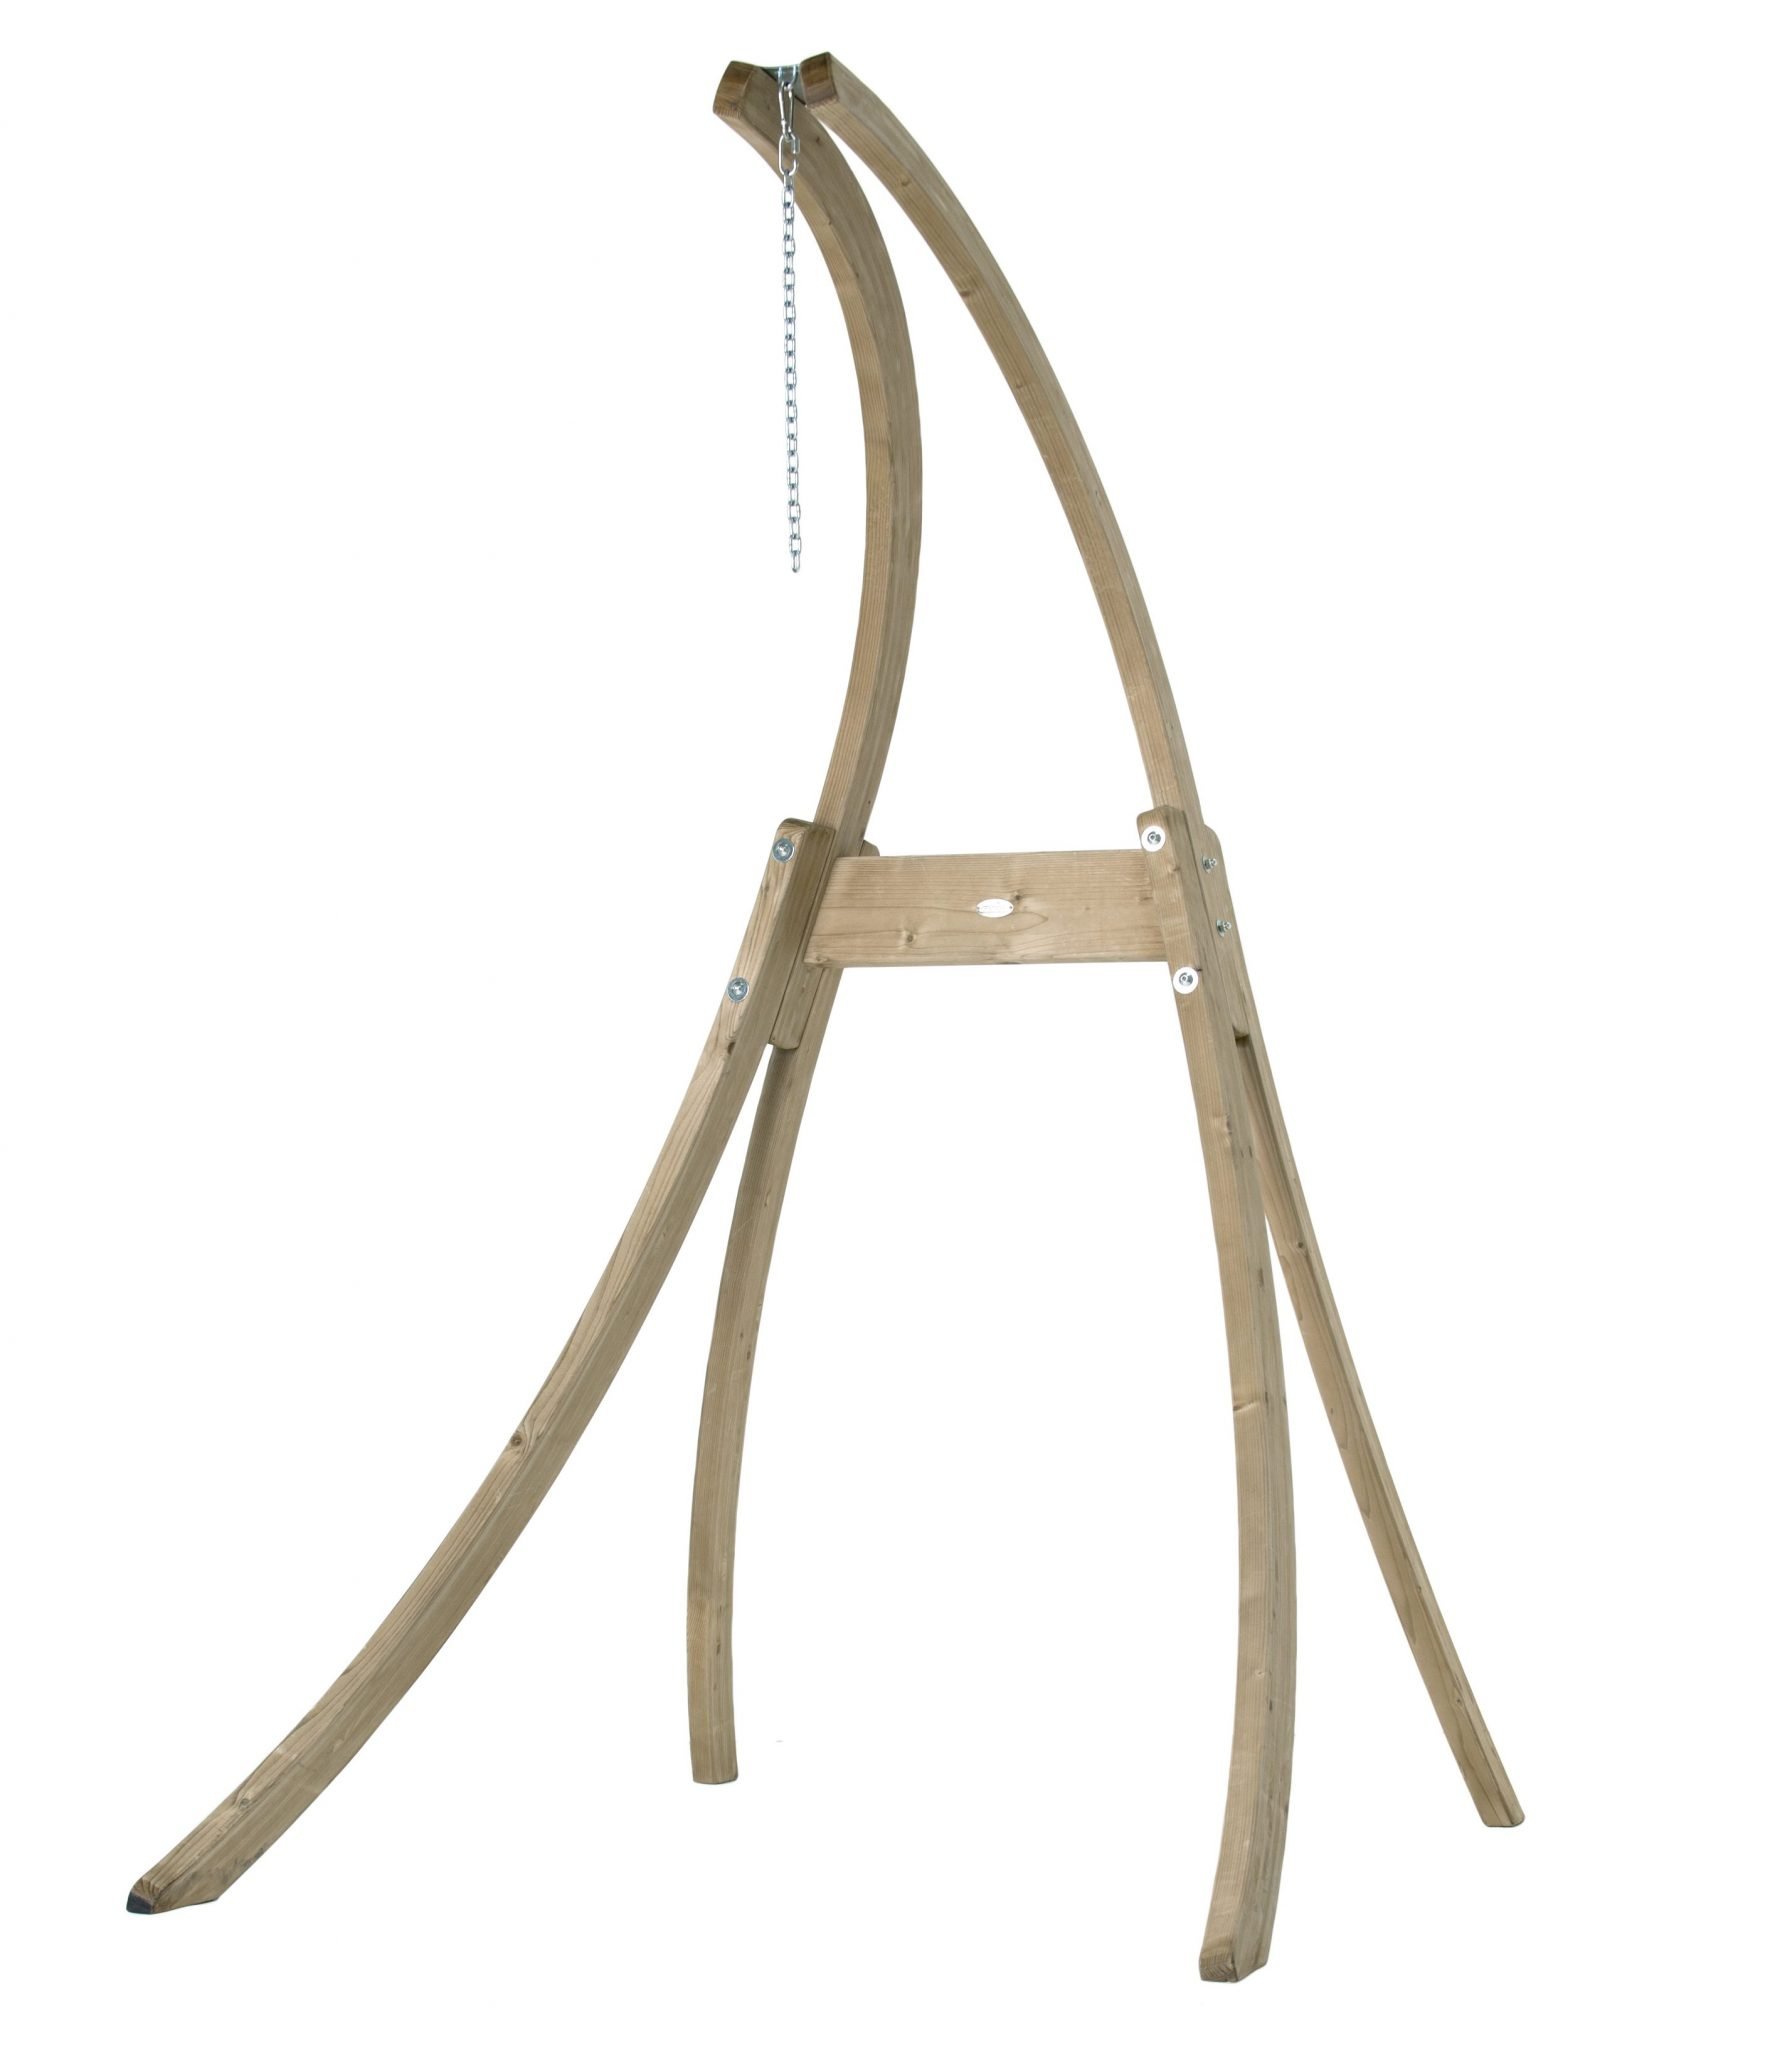 Stunning Cheap Wooden Swing Chair Stand Hammock Chair Stands Hanging Chair Stand Sale Hanging Chair Stand Uk houzz-03 Hanging Chair Stand